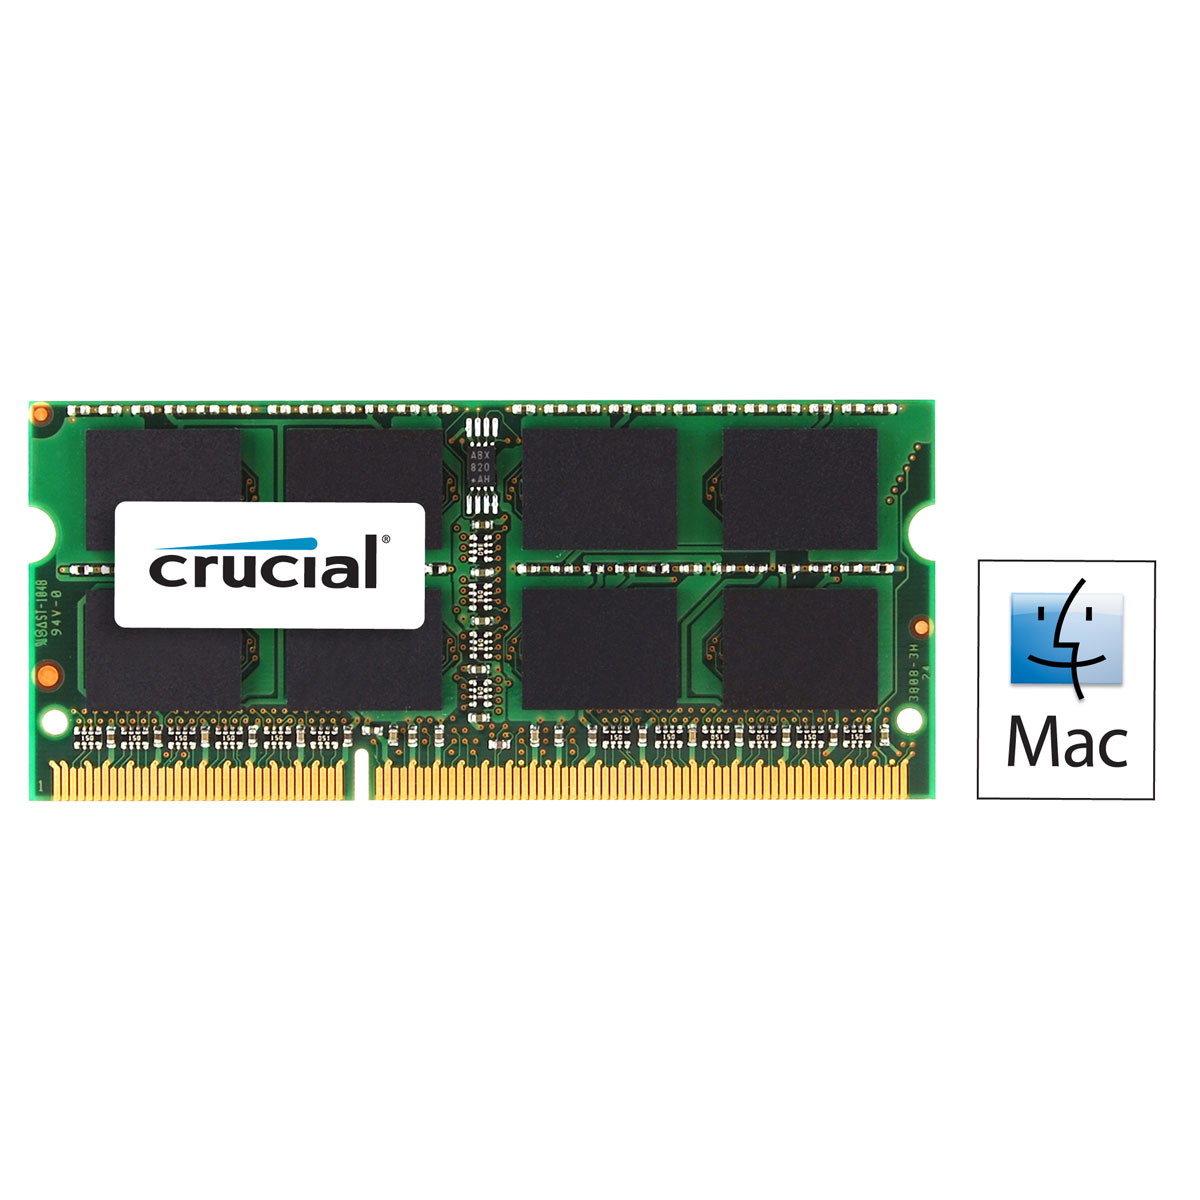 Mémoire PC Crucial for Mac SO-DIMM 2 Go DDR3 1333 MHz CL9 RAM SO-DIMM DDR3 PC10600 - CT2G3S1339MCEU (garantie à vie par Crucial)